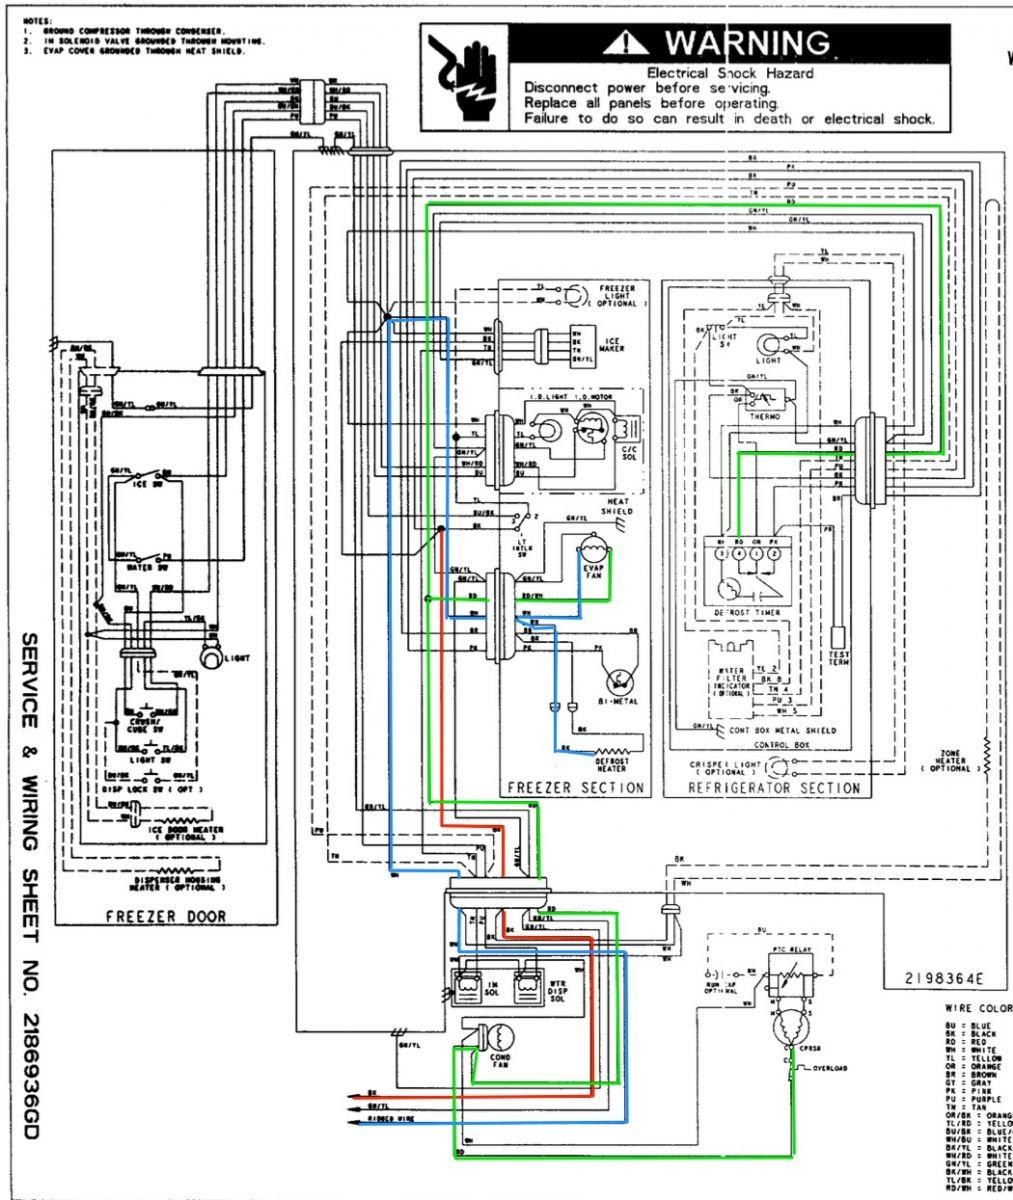 whelen pcc s9 wiring diagram whelen switch box wiring